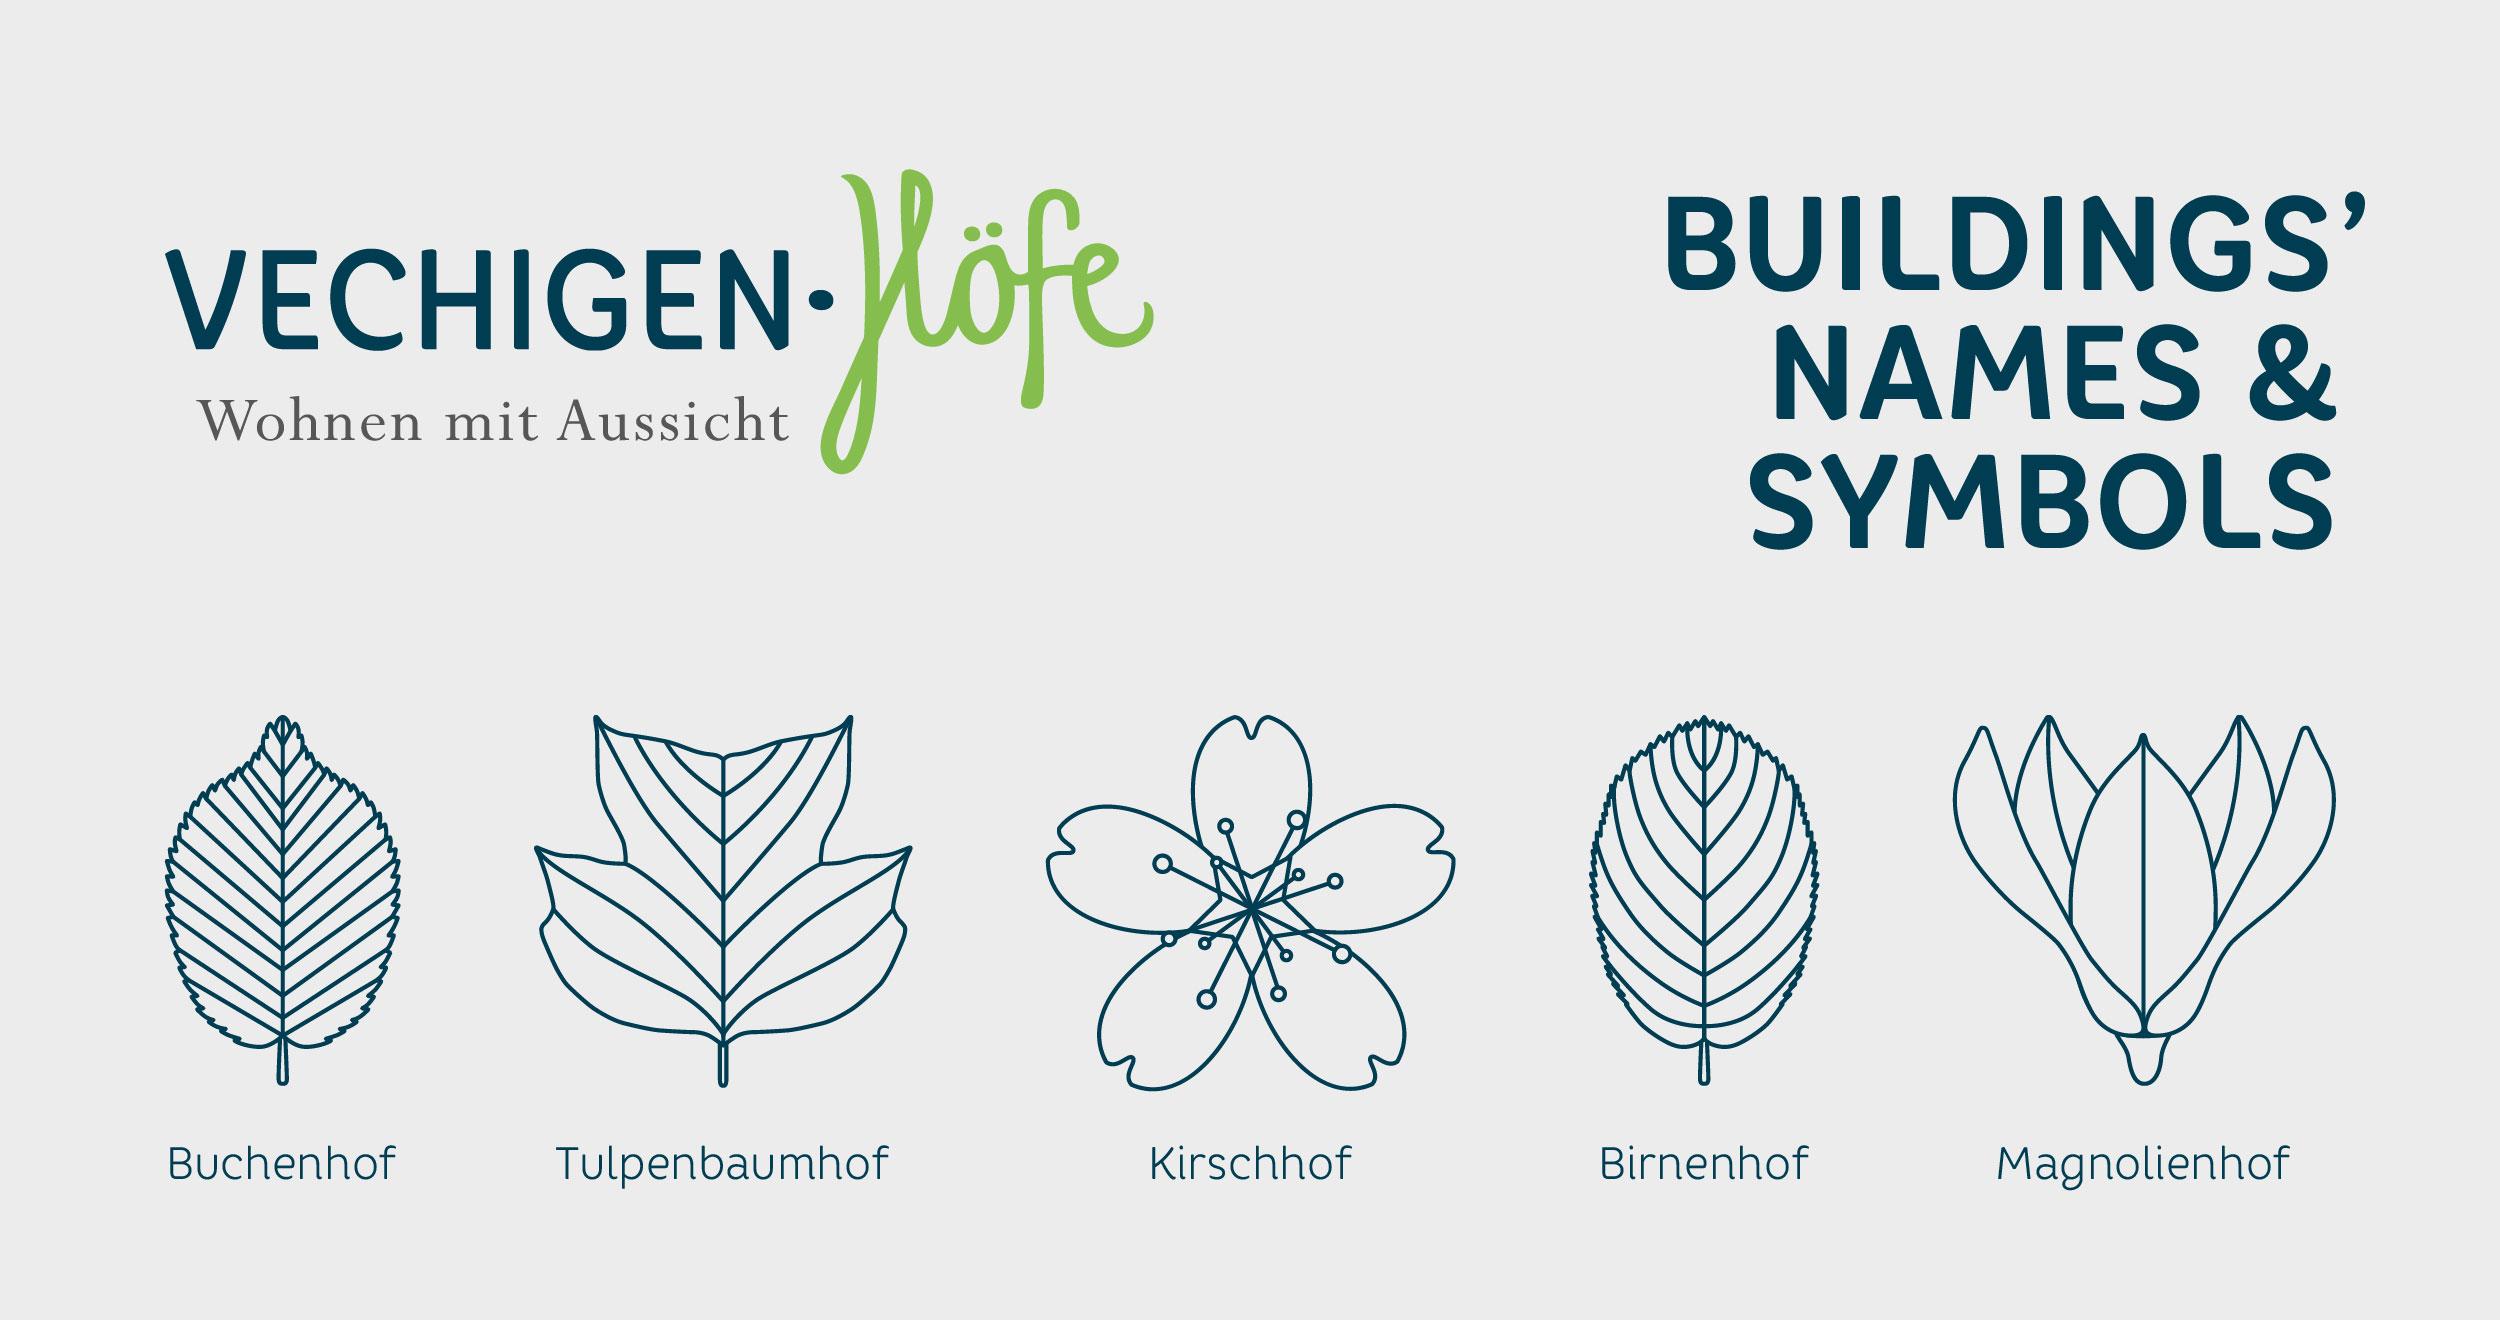 Vechigen Höfe symbols by GPU Design